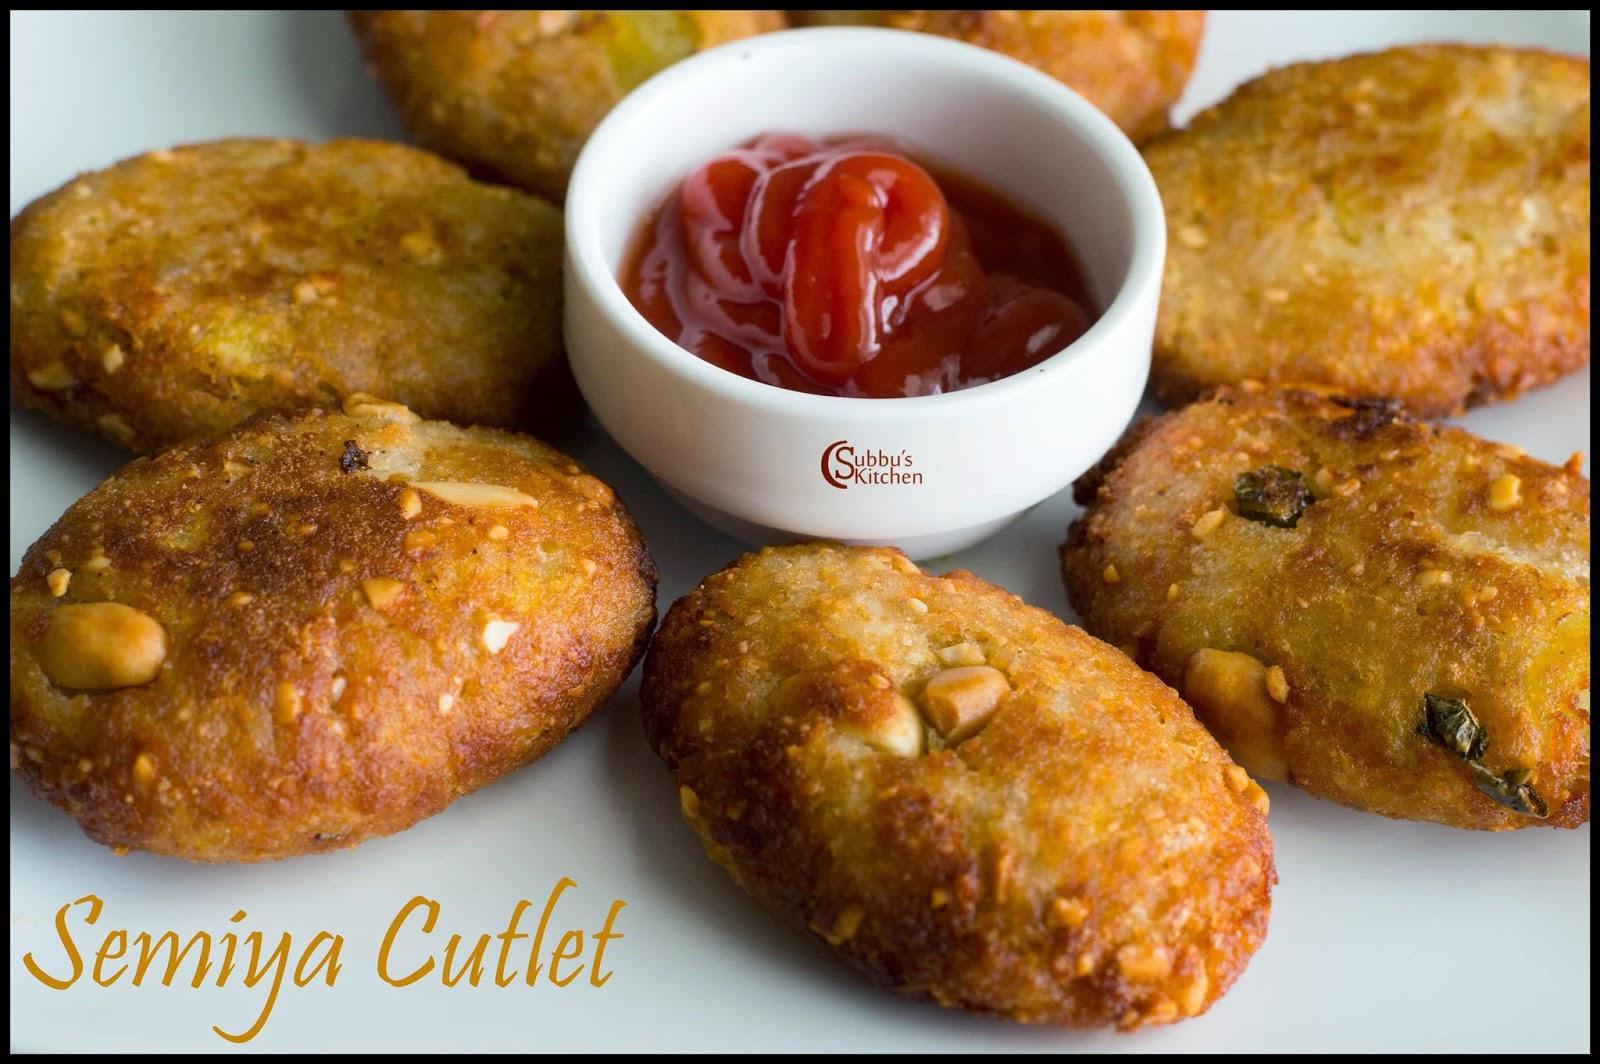 Vermicilli Cutlet Recipe | Semiya Cutlet Recipe